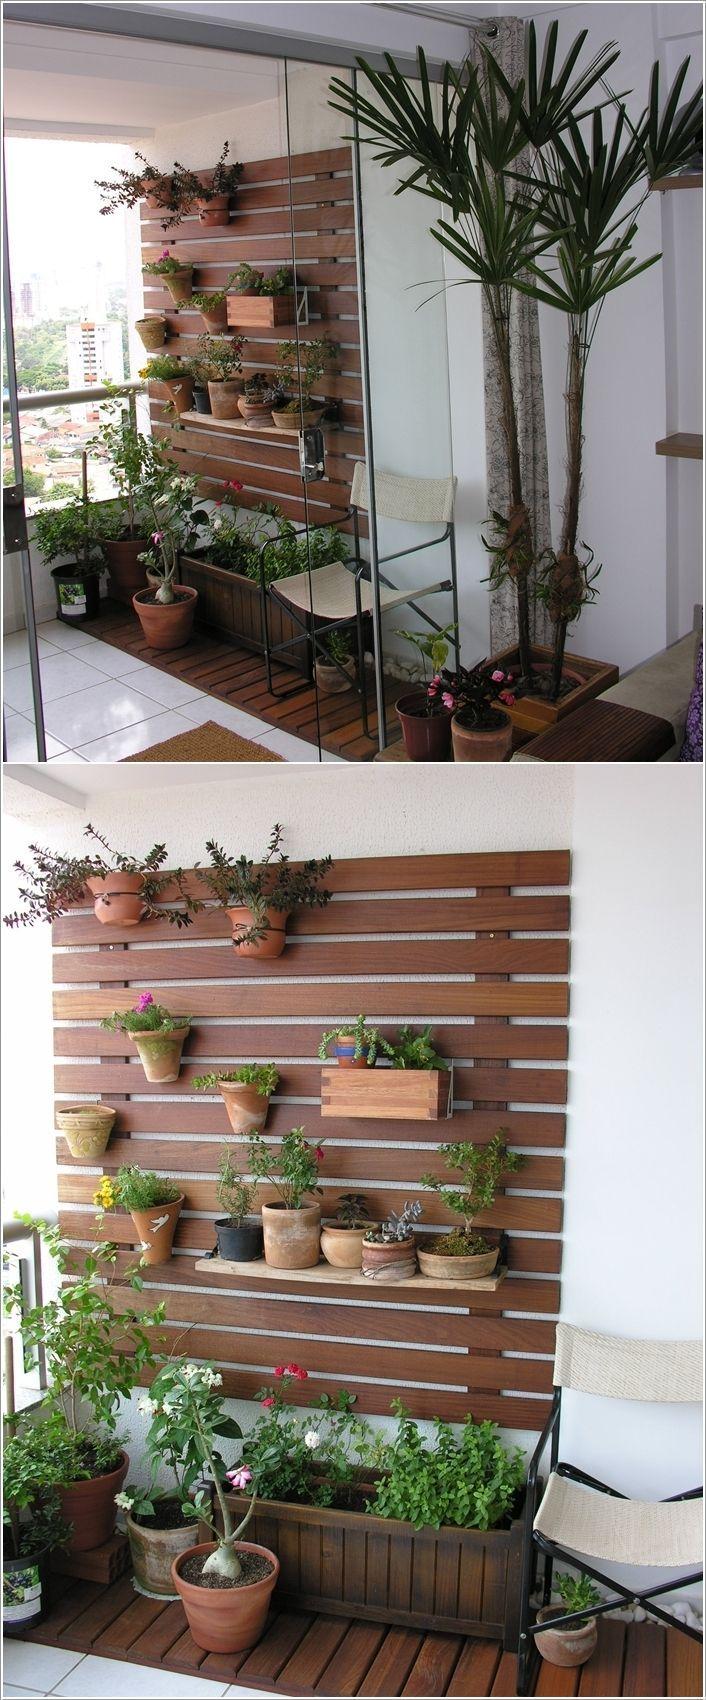 20 creative outdoor wall decor ideas decor balcony - Exterior wall decorations for house ...